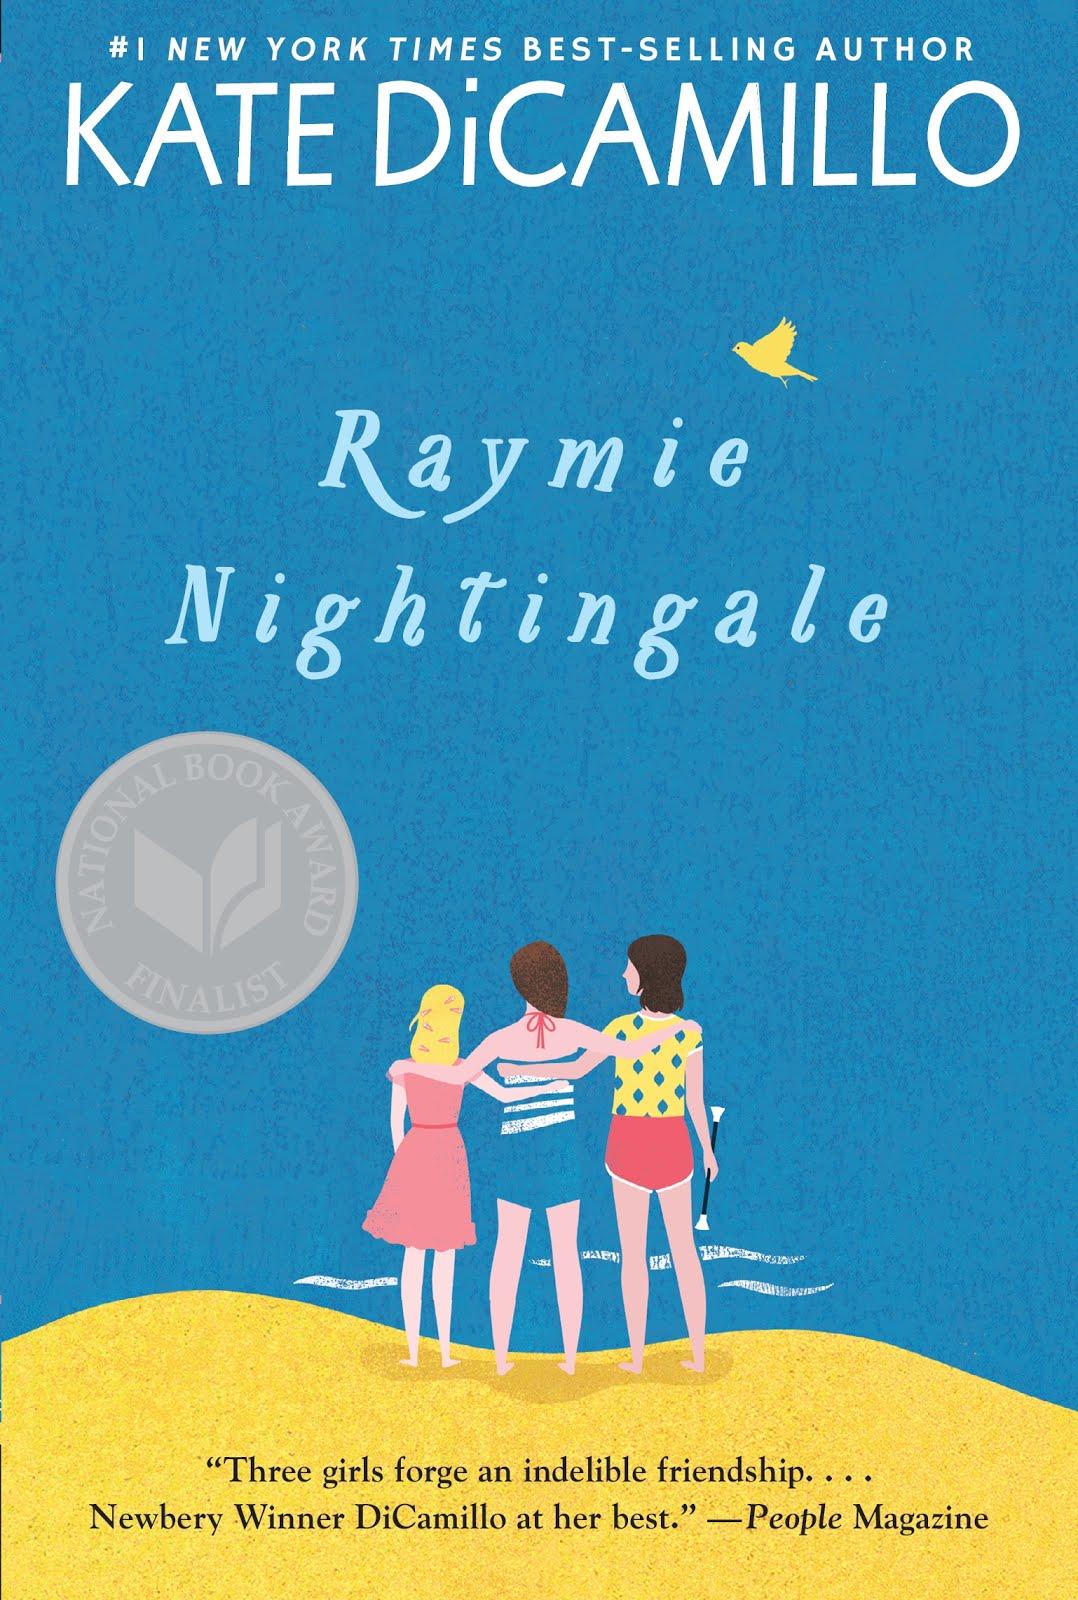 Kate DiCamillo – Raymie Nightingale Genre: Author: